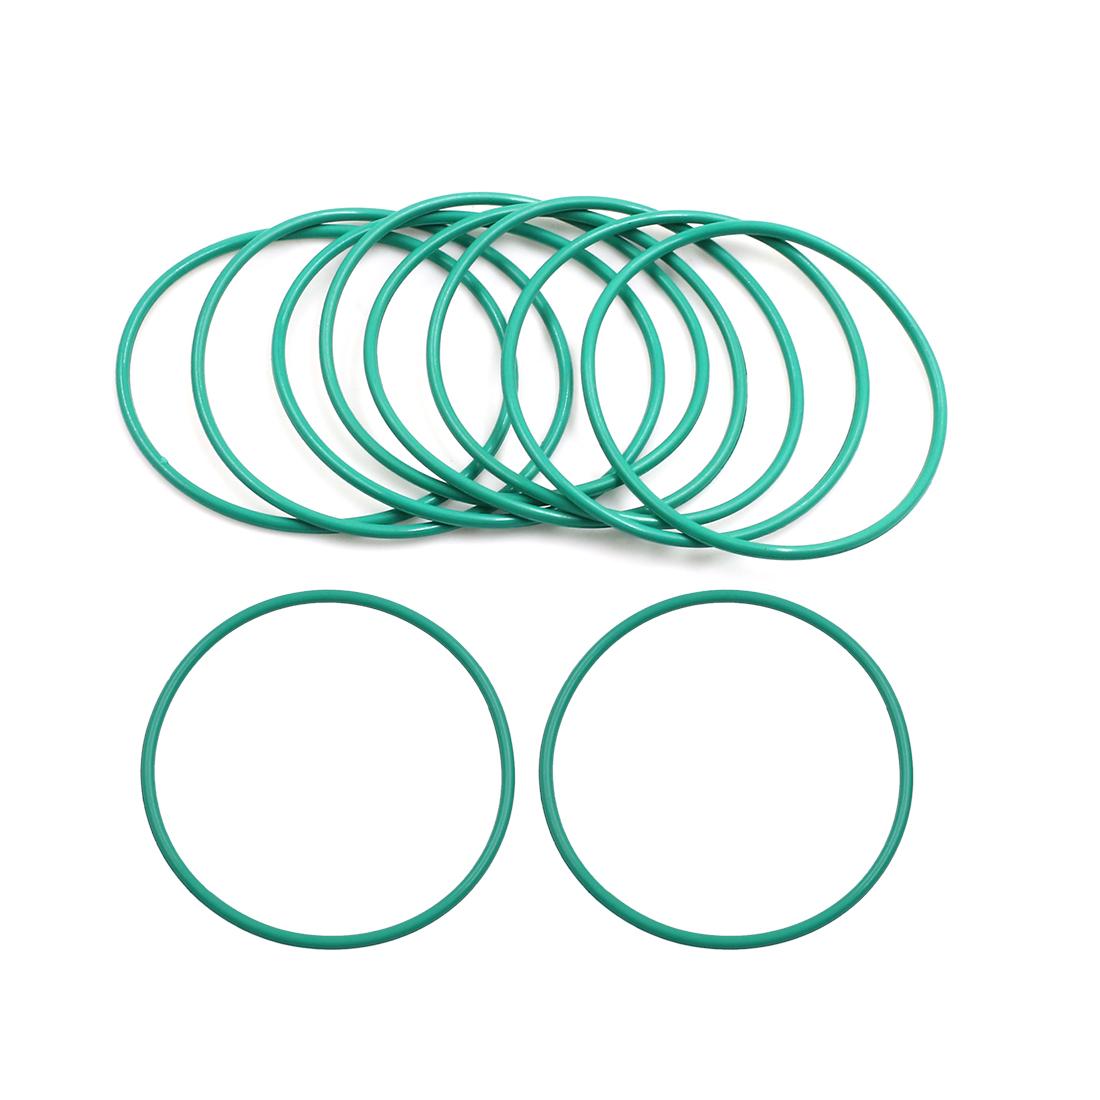 10pcs Green Universal FKM O-Ring Sealing Gasket Washer for Car 50mm x 2mm